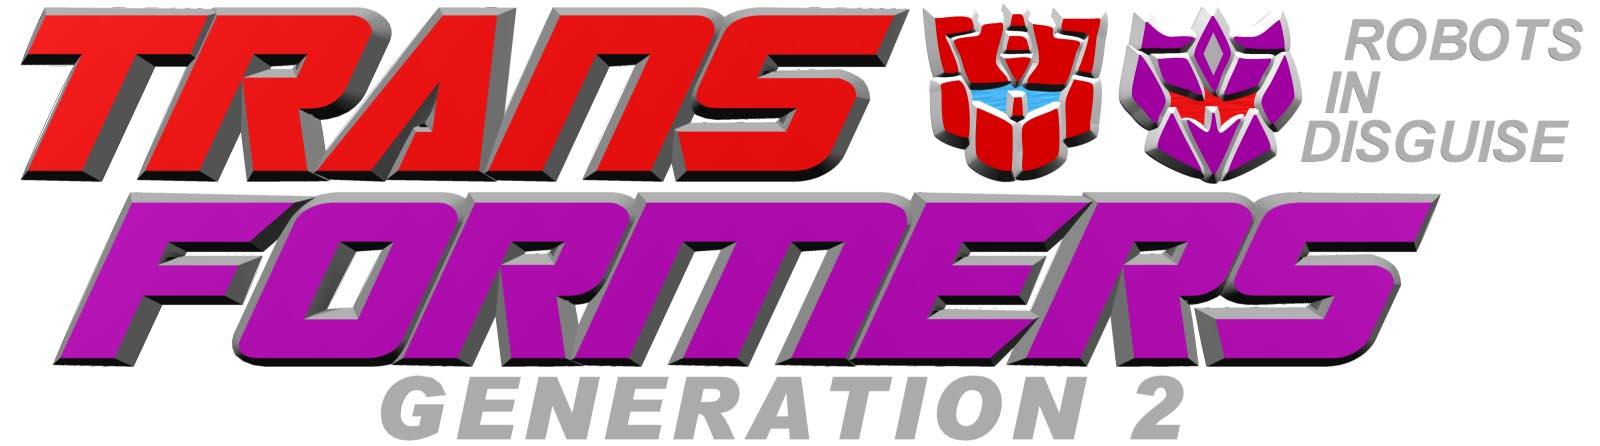 Generation 2 Transformers